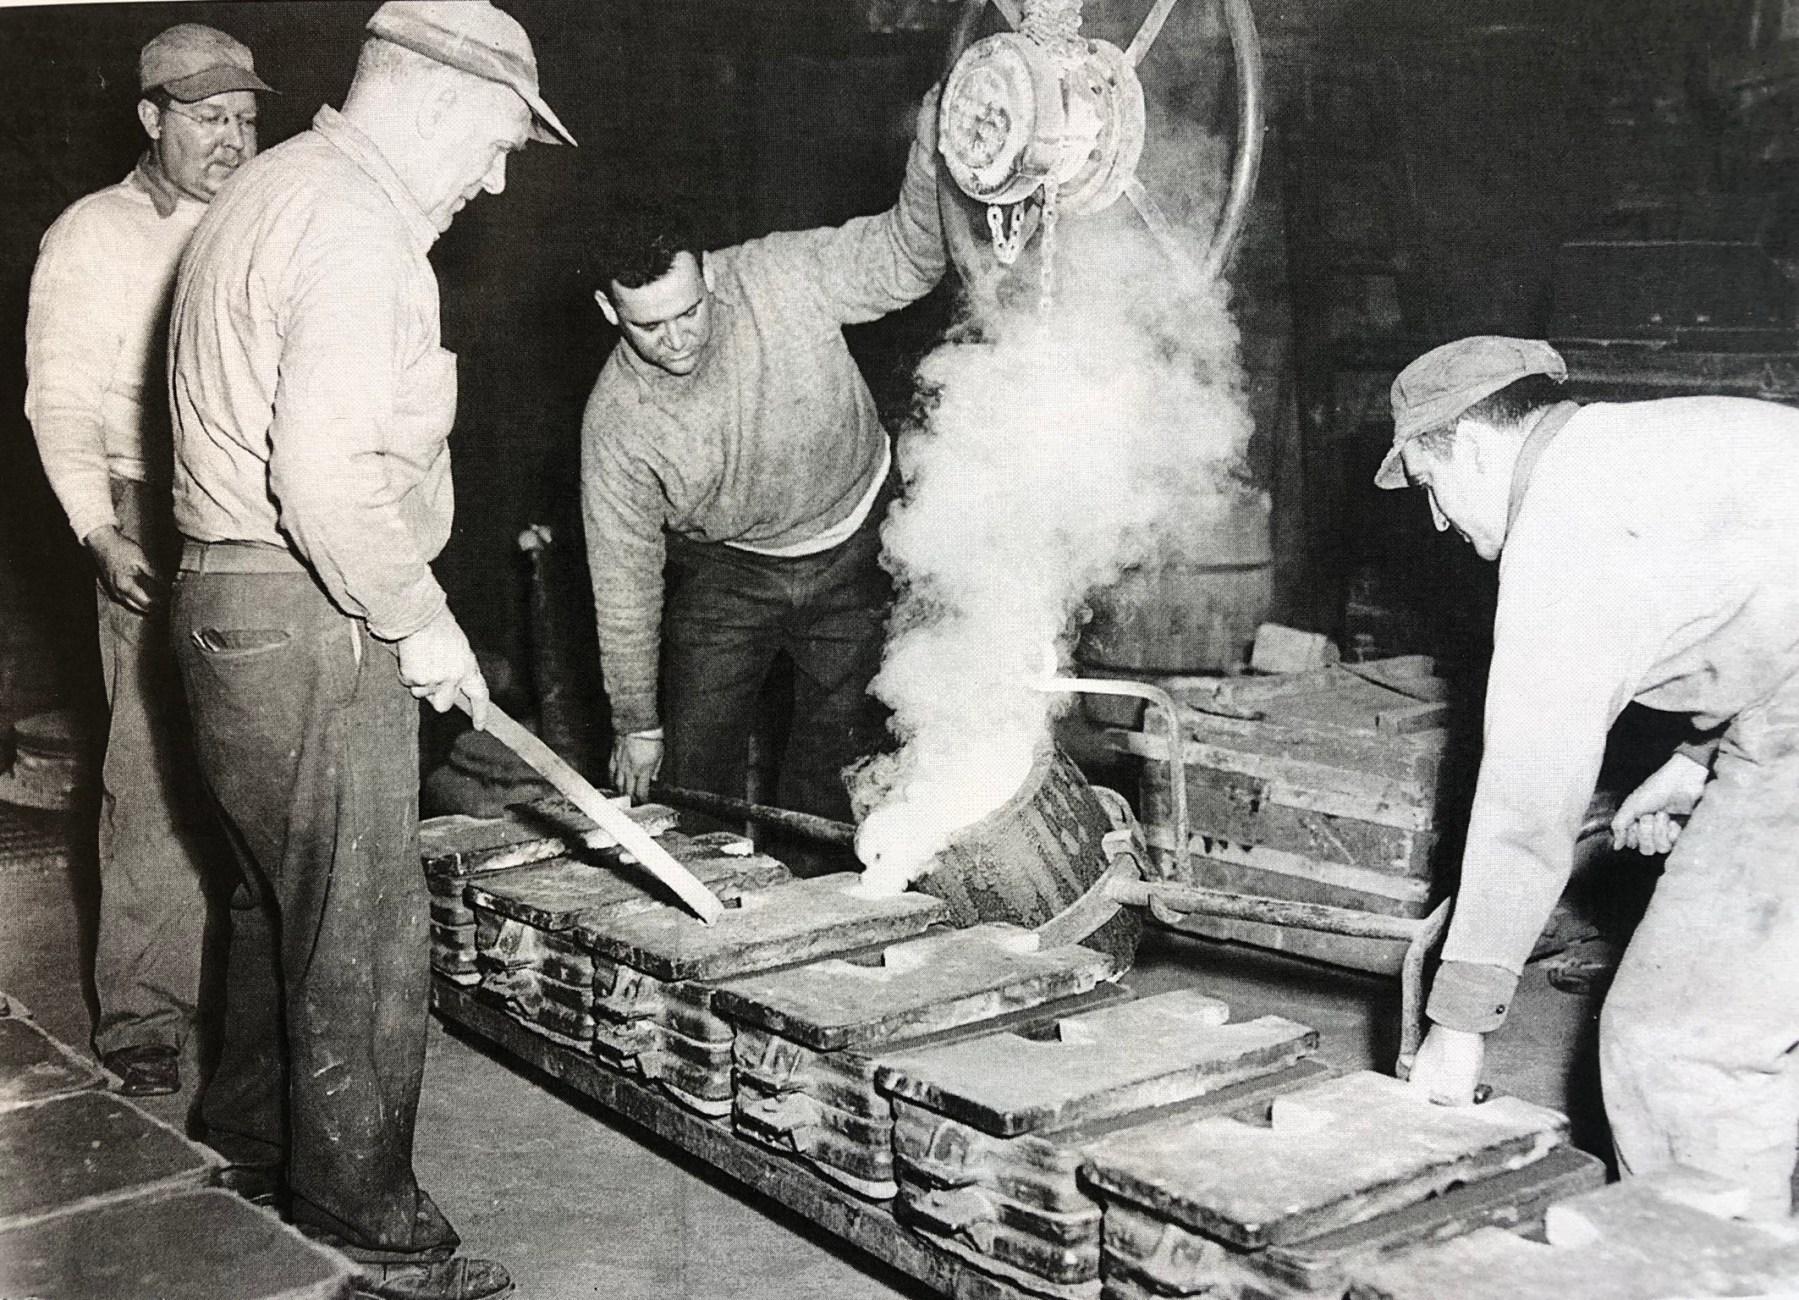 John H. McCafferty & Sons brass foundry, 12 Green Street Woburn